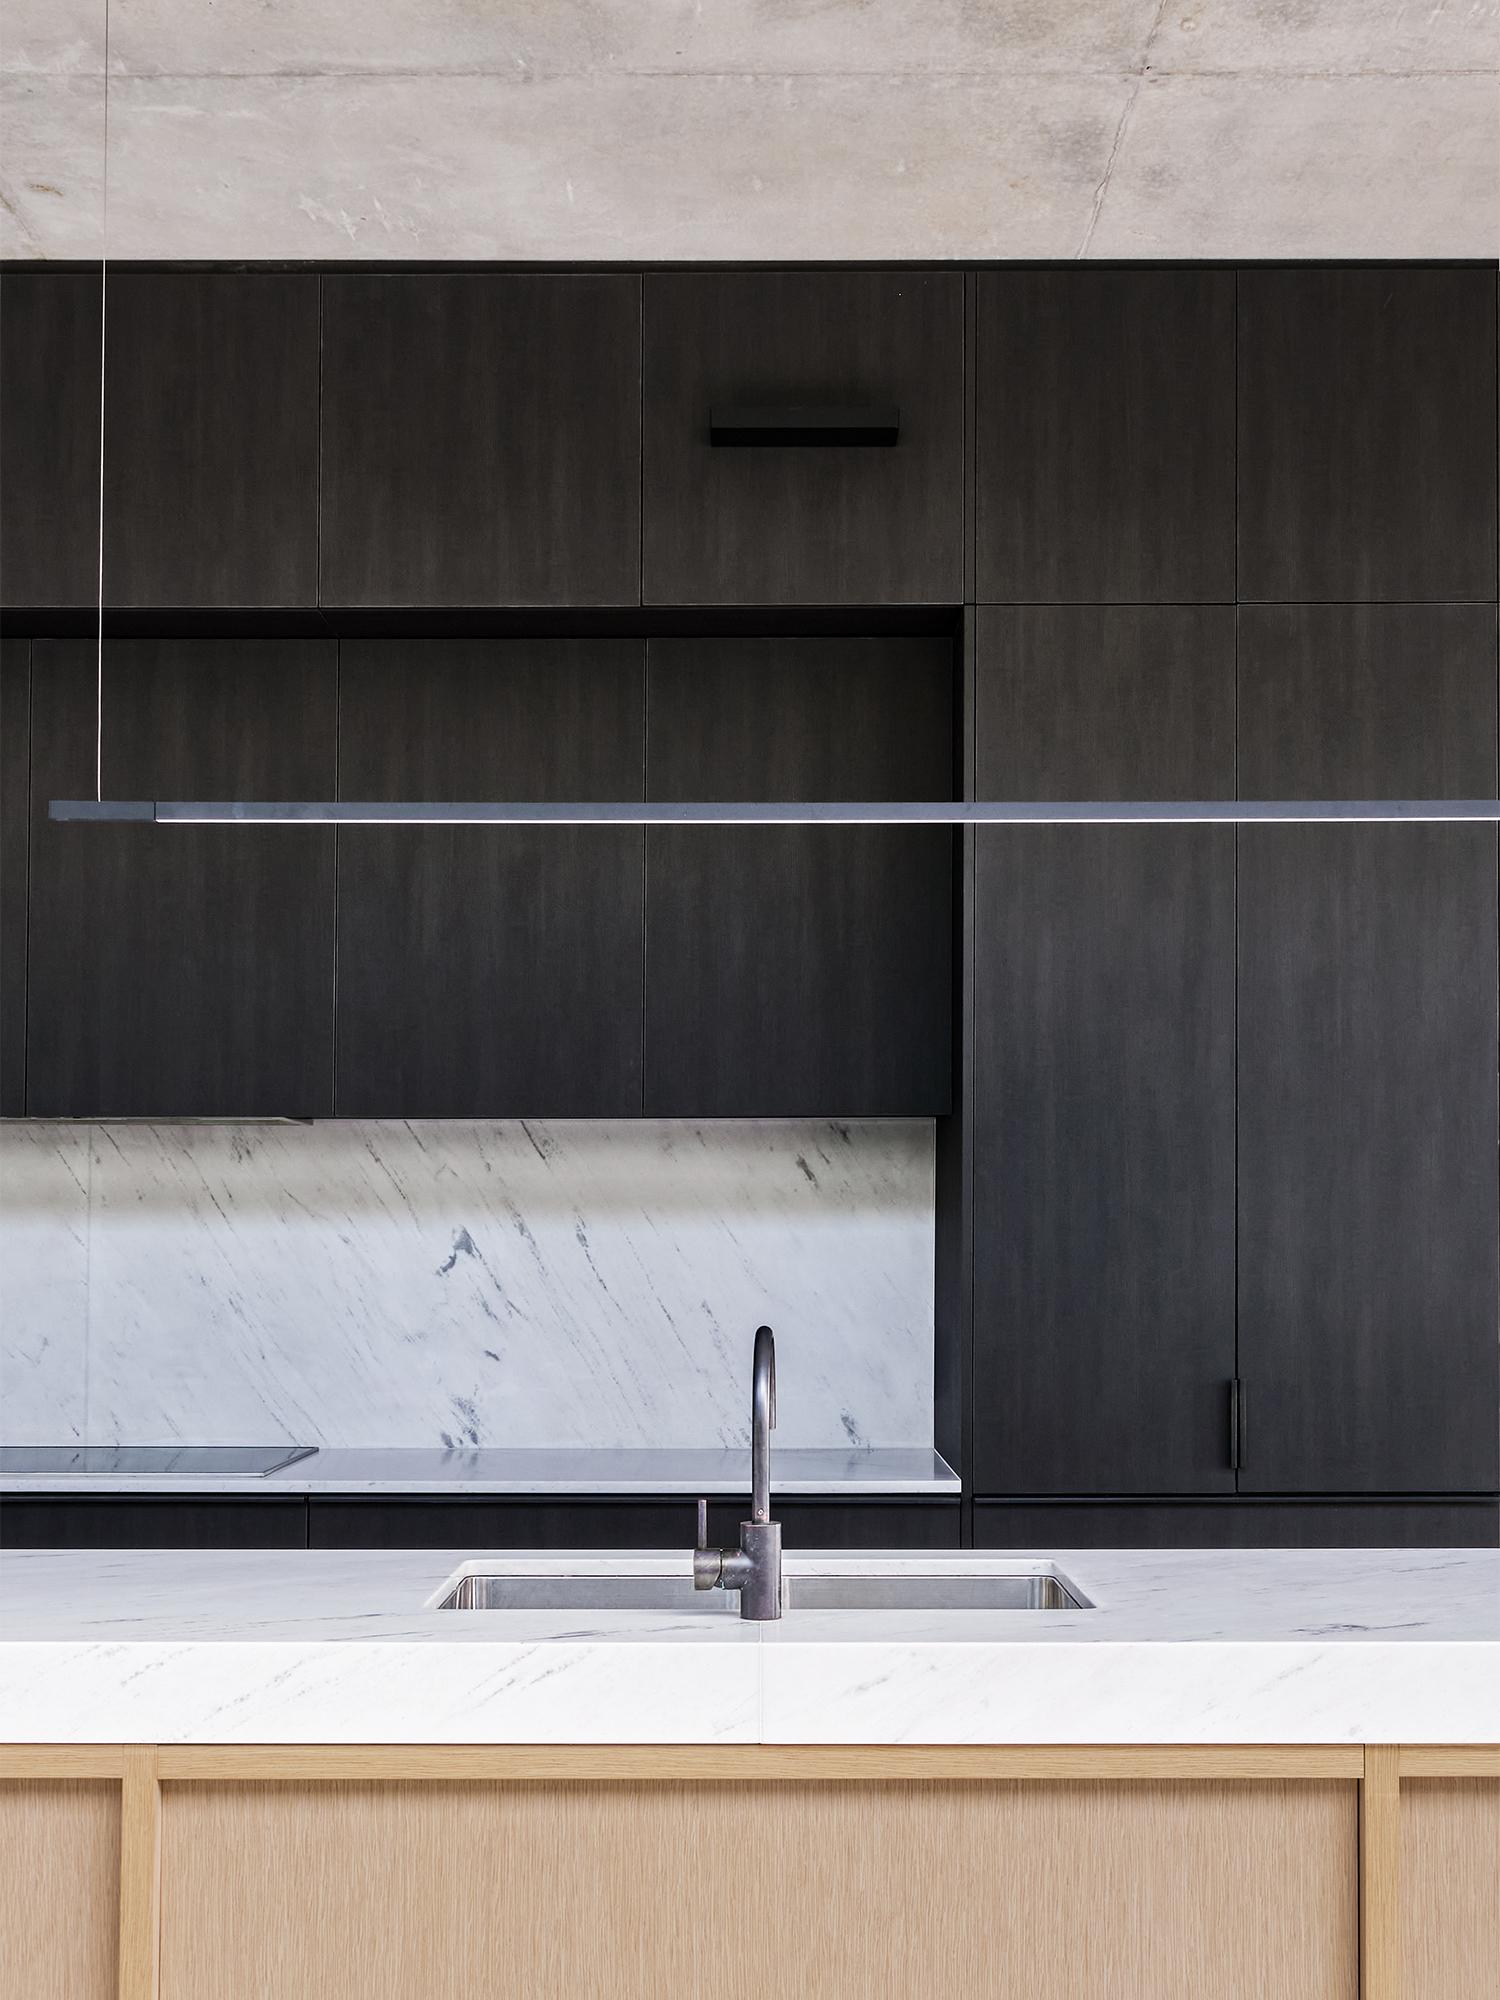 Mosman House II Tribe Studio Architects 19